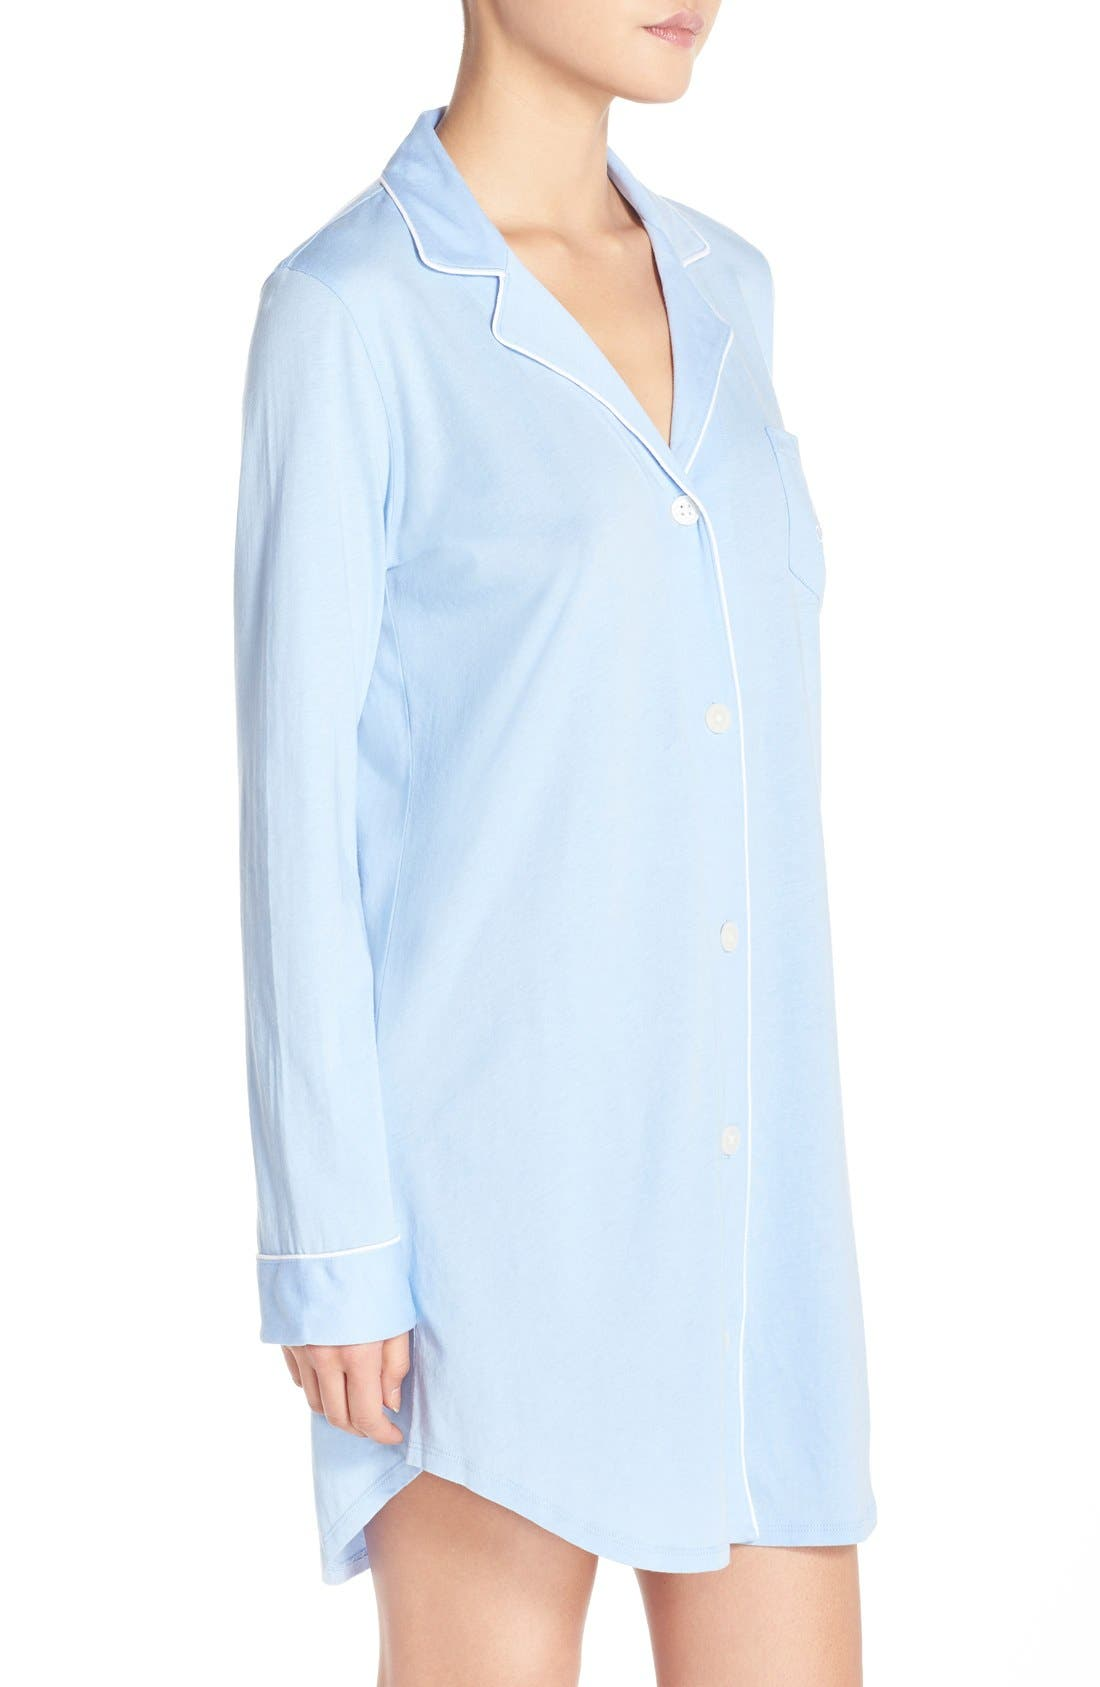 Alternate Image 3  - Lauren Ralph Lauren Knit Nightshirt (Online Only)